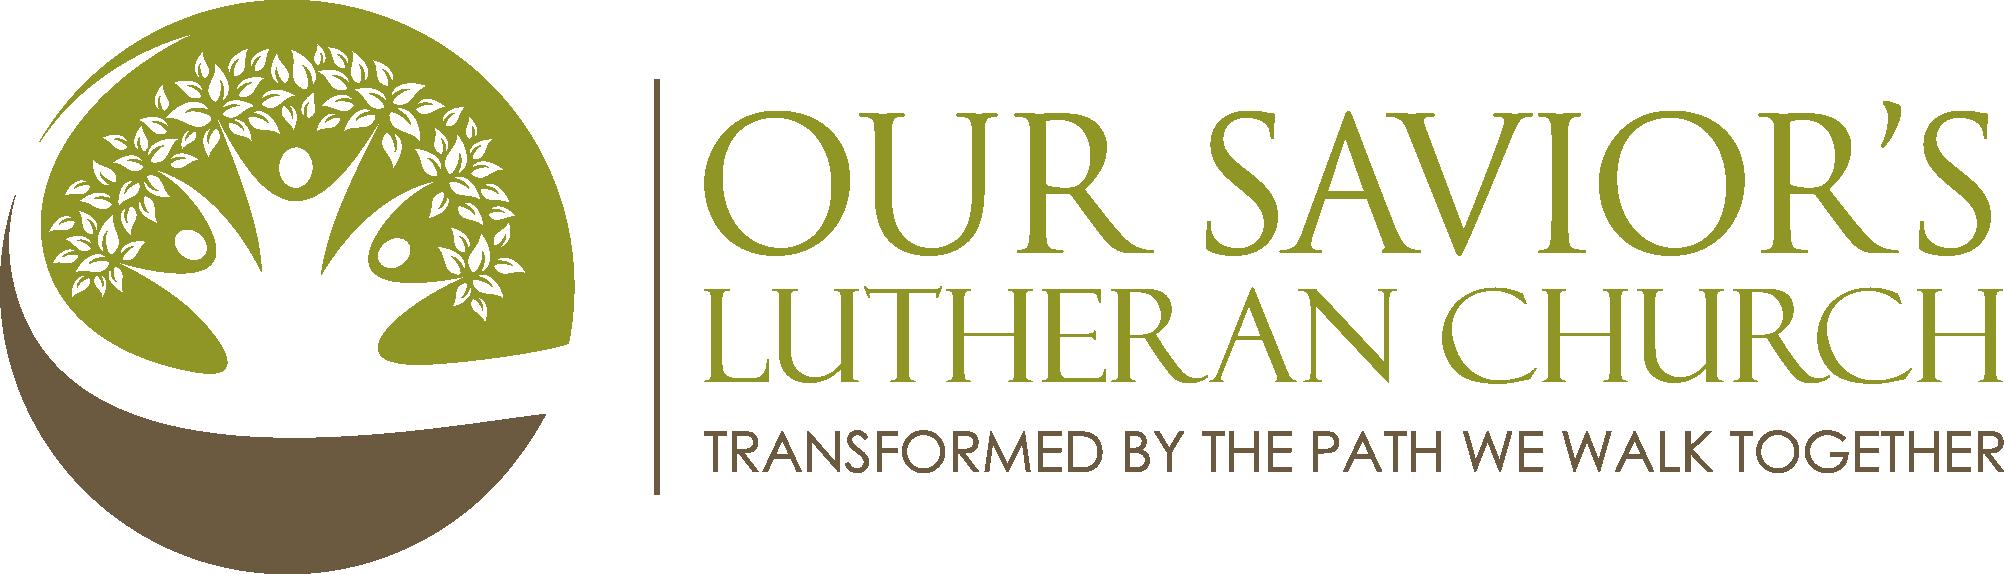 OurSaviors logo